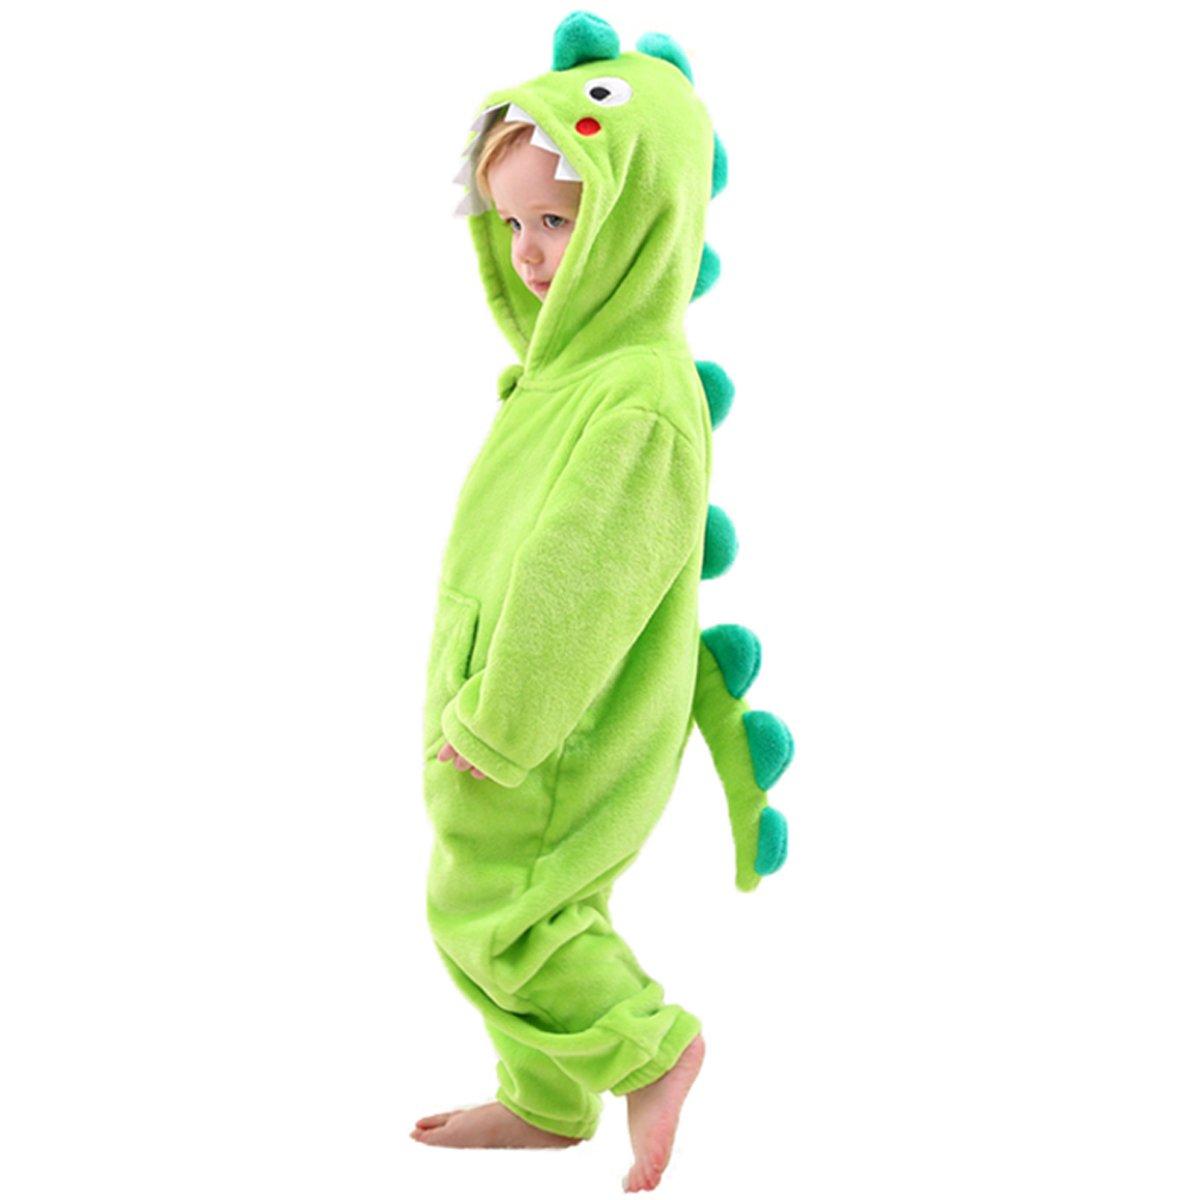 Little Boys Dinosaur Dragon Costume Onesie -Kids Fleece Pajama